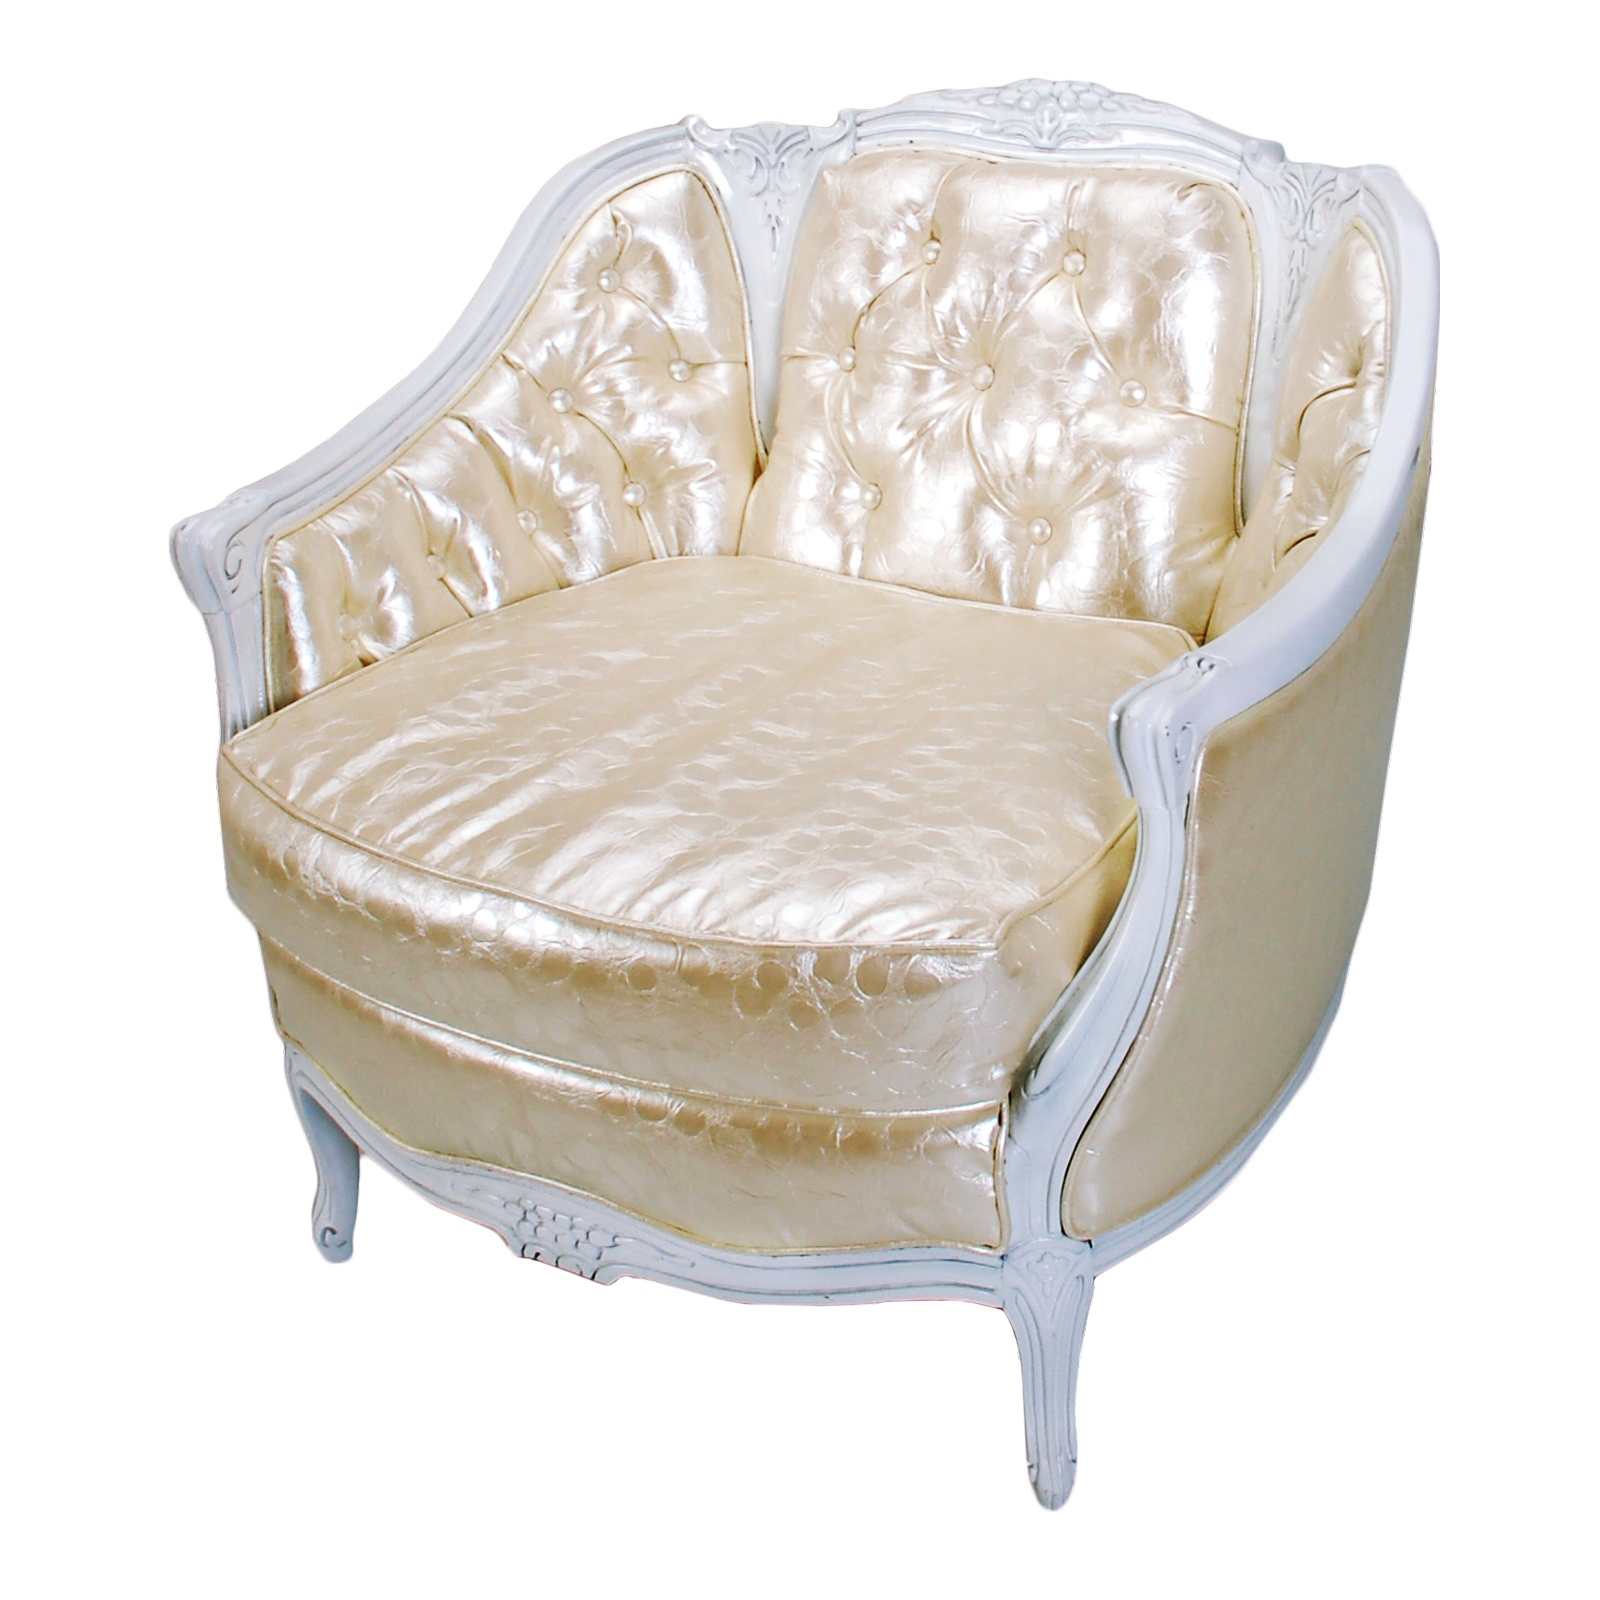 Tiffany Parlor Chair FormDecor